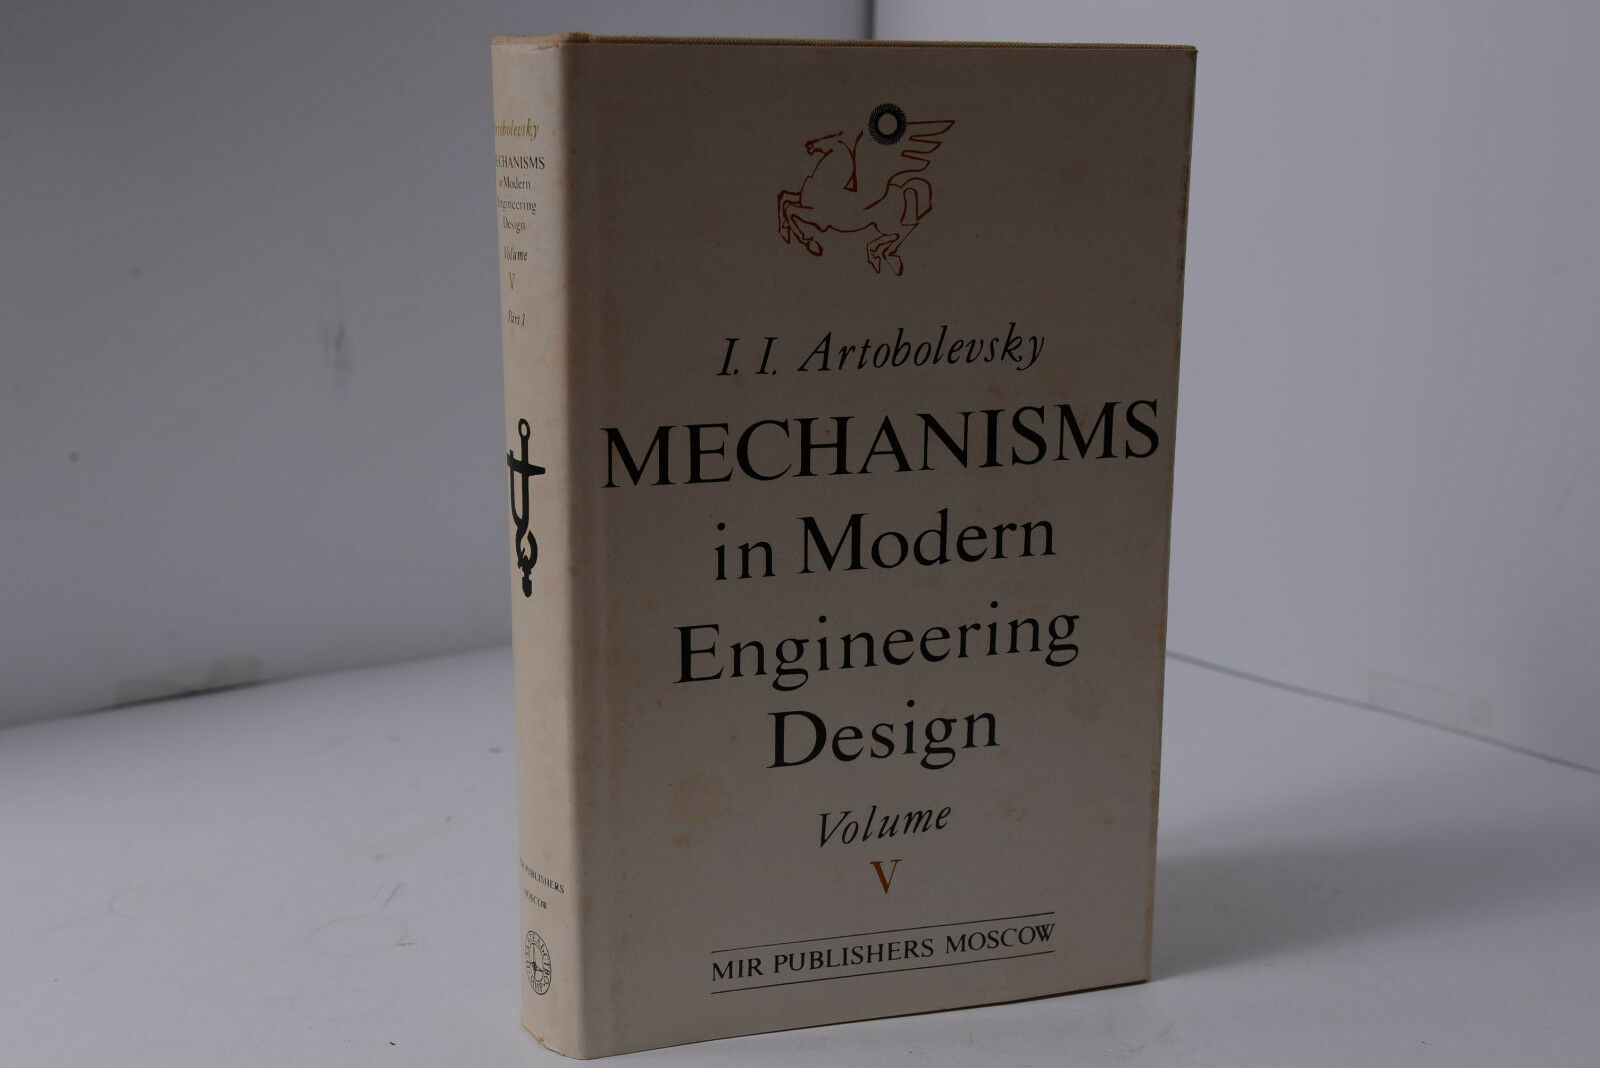 Books mechanics in modern engineering design volume v 1 by i i artobolevsky rare fandeluxe Image collections